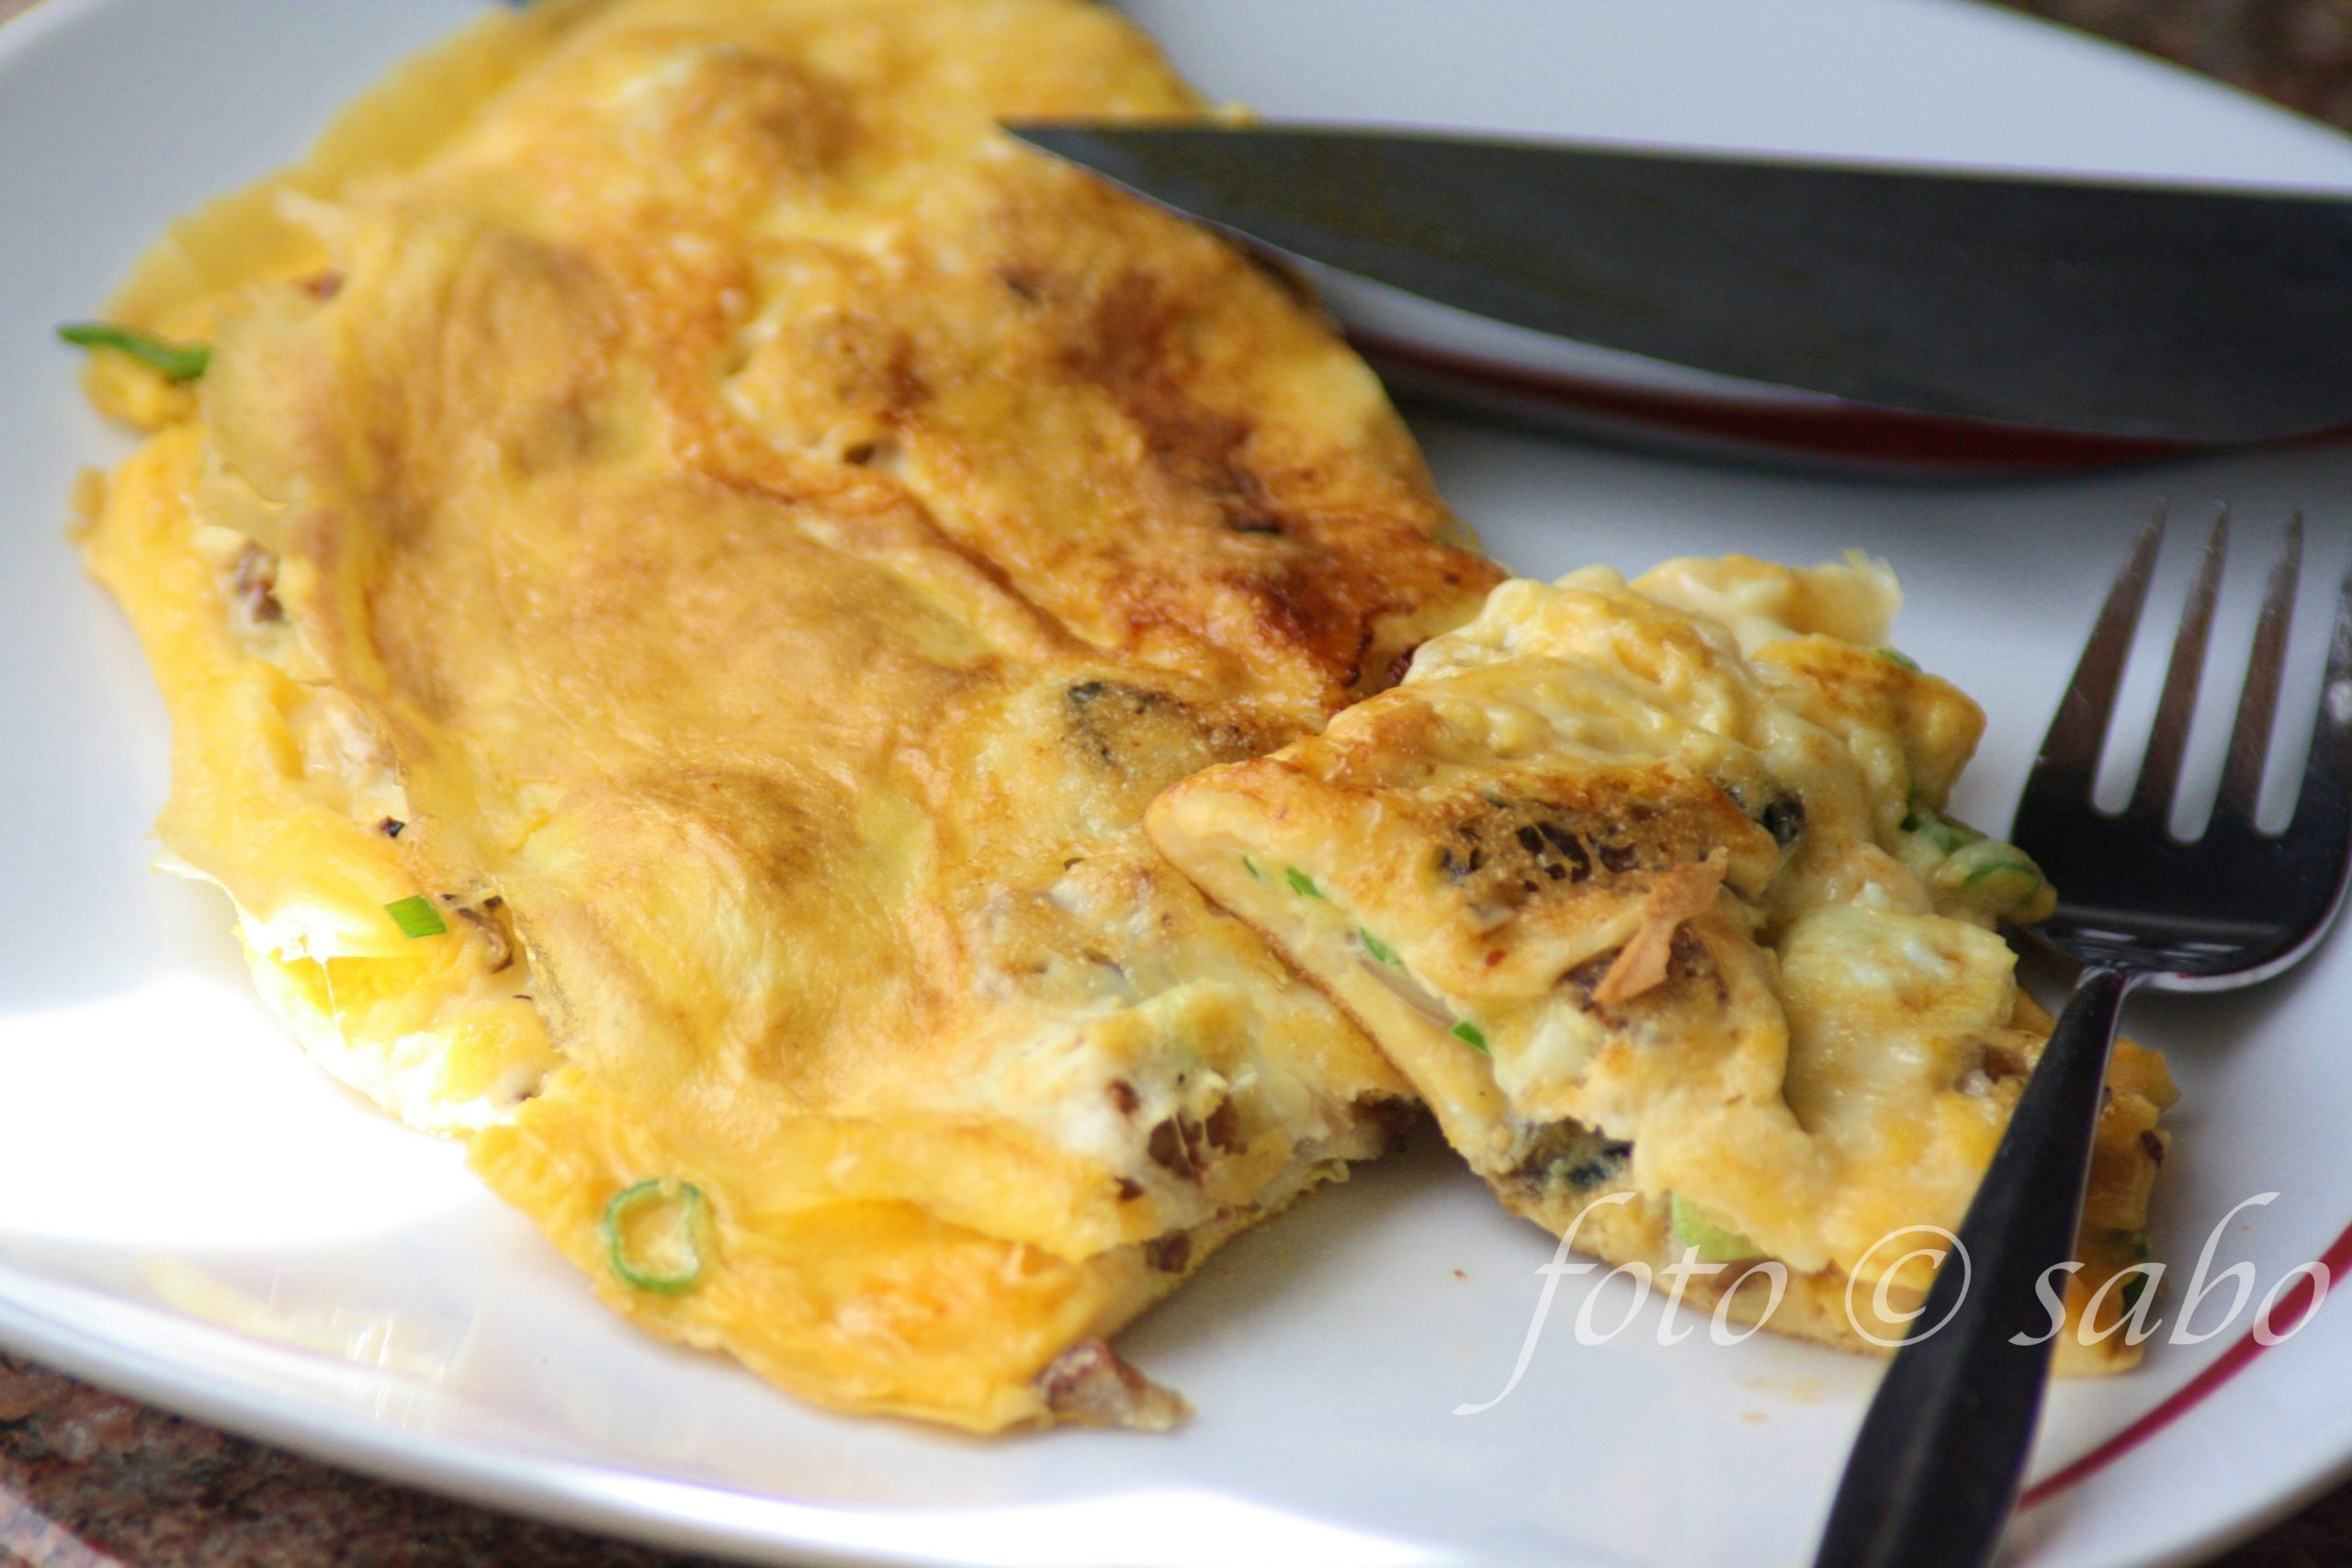 Egg Chalupa Grundrezept (Low Carb / Keto)